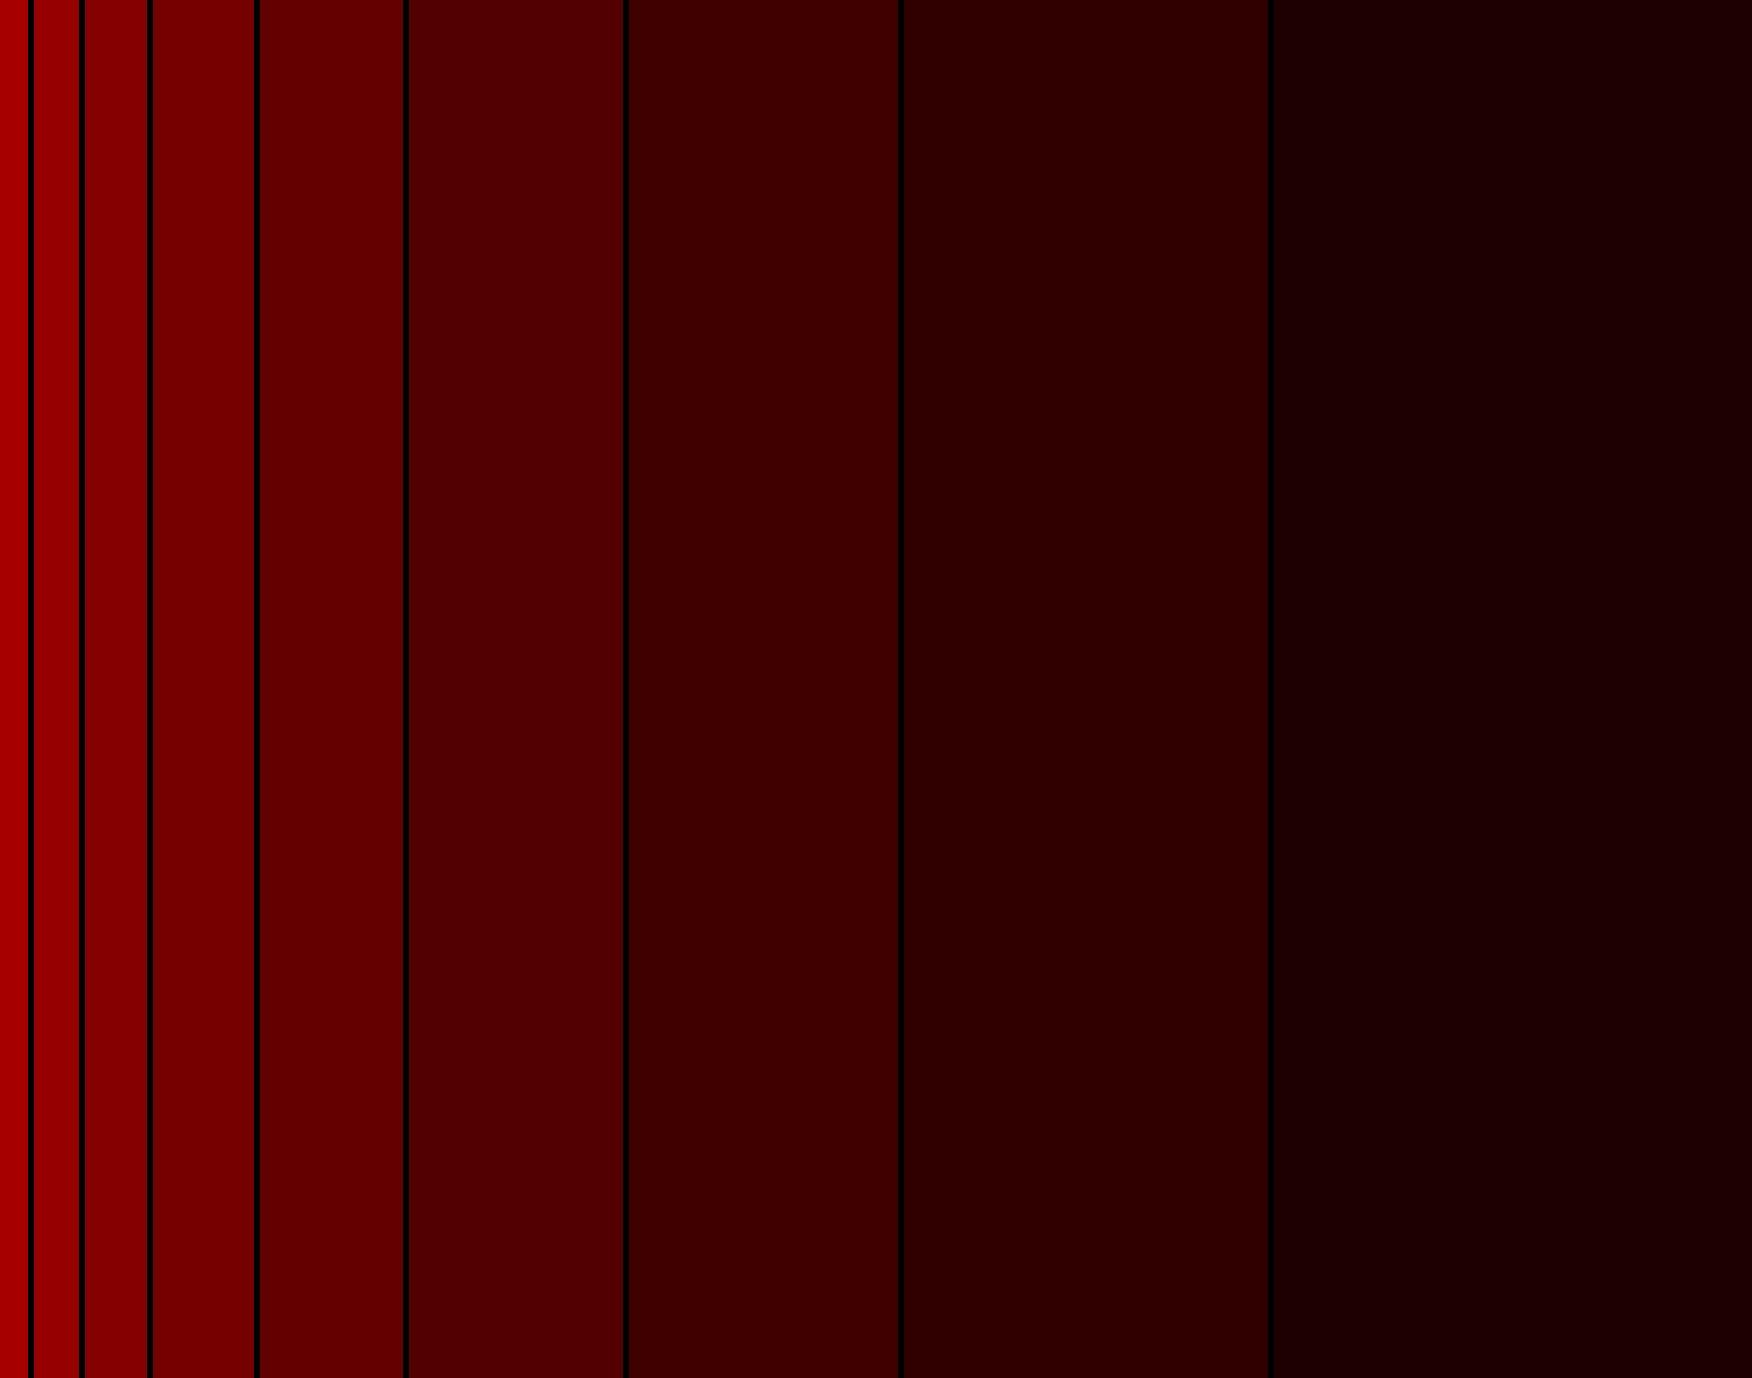 maroon backgrounds